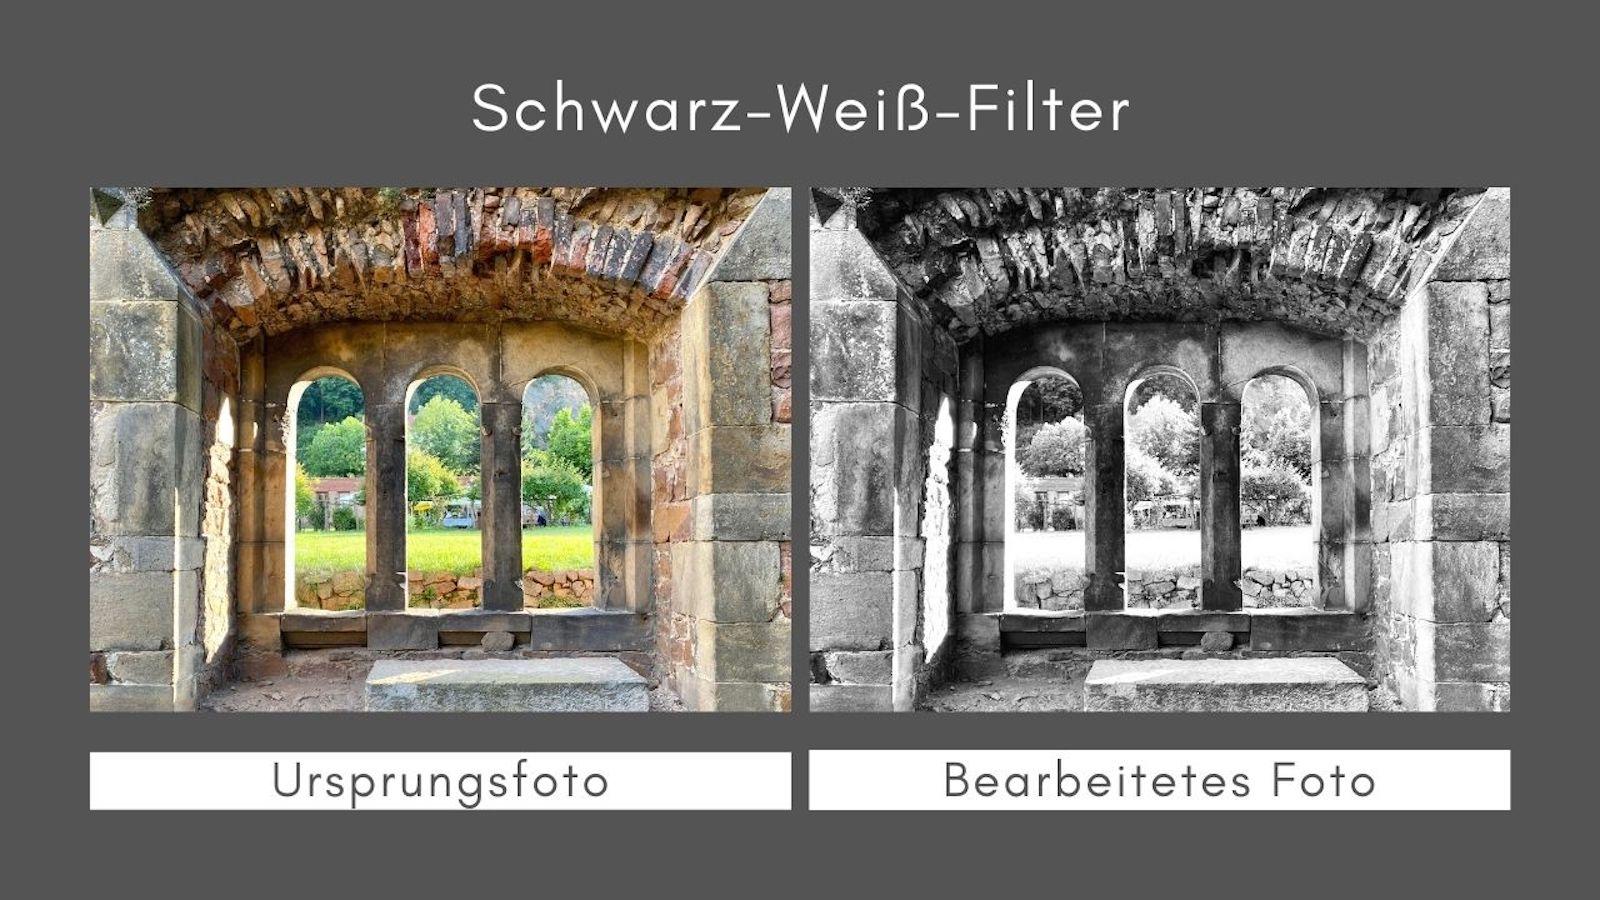 Schwarz-Weiss-Filter